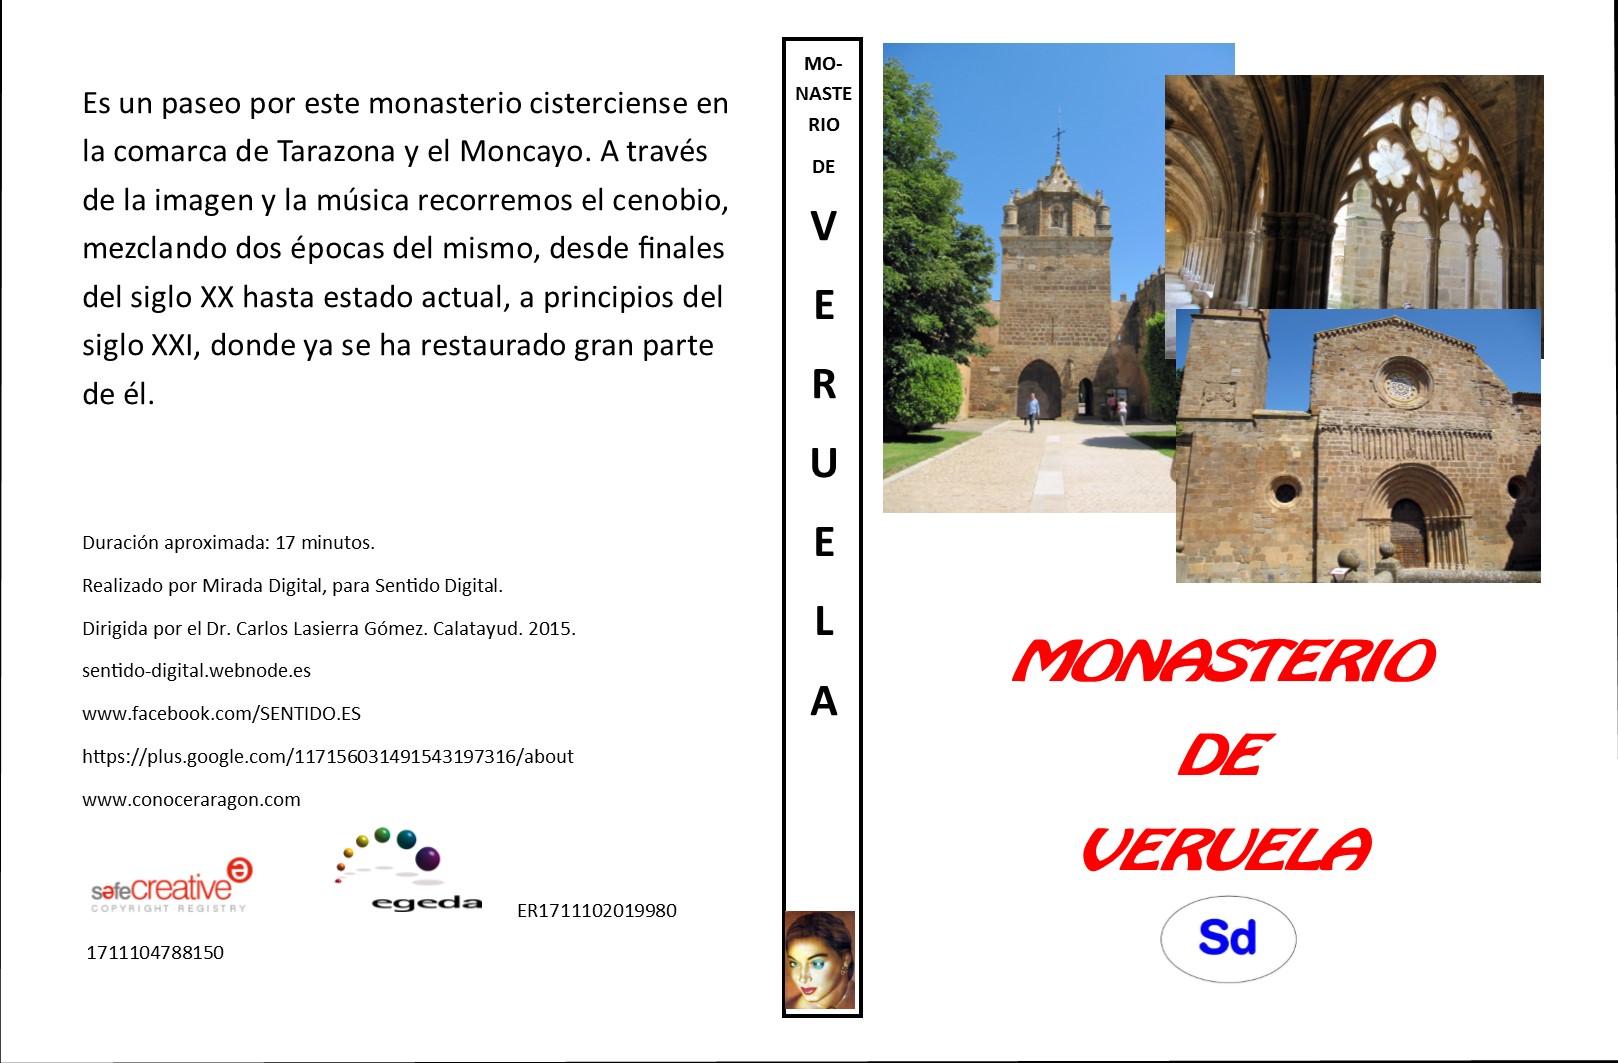 Monasterio de Veruela